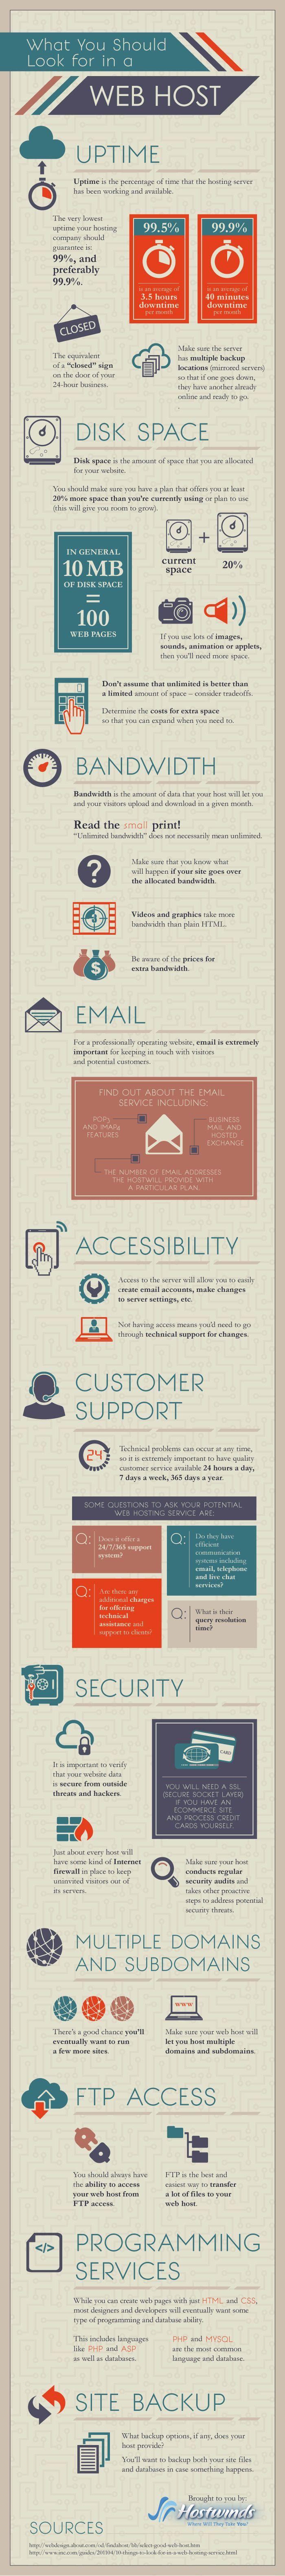 Qué debéis mirar en un hosting para web #infografia #infographic #internet